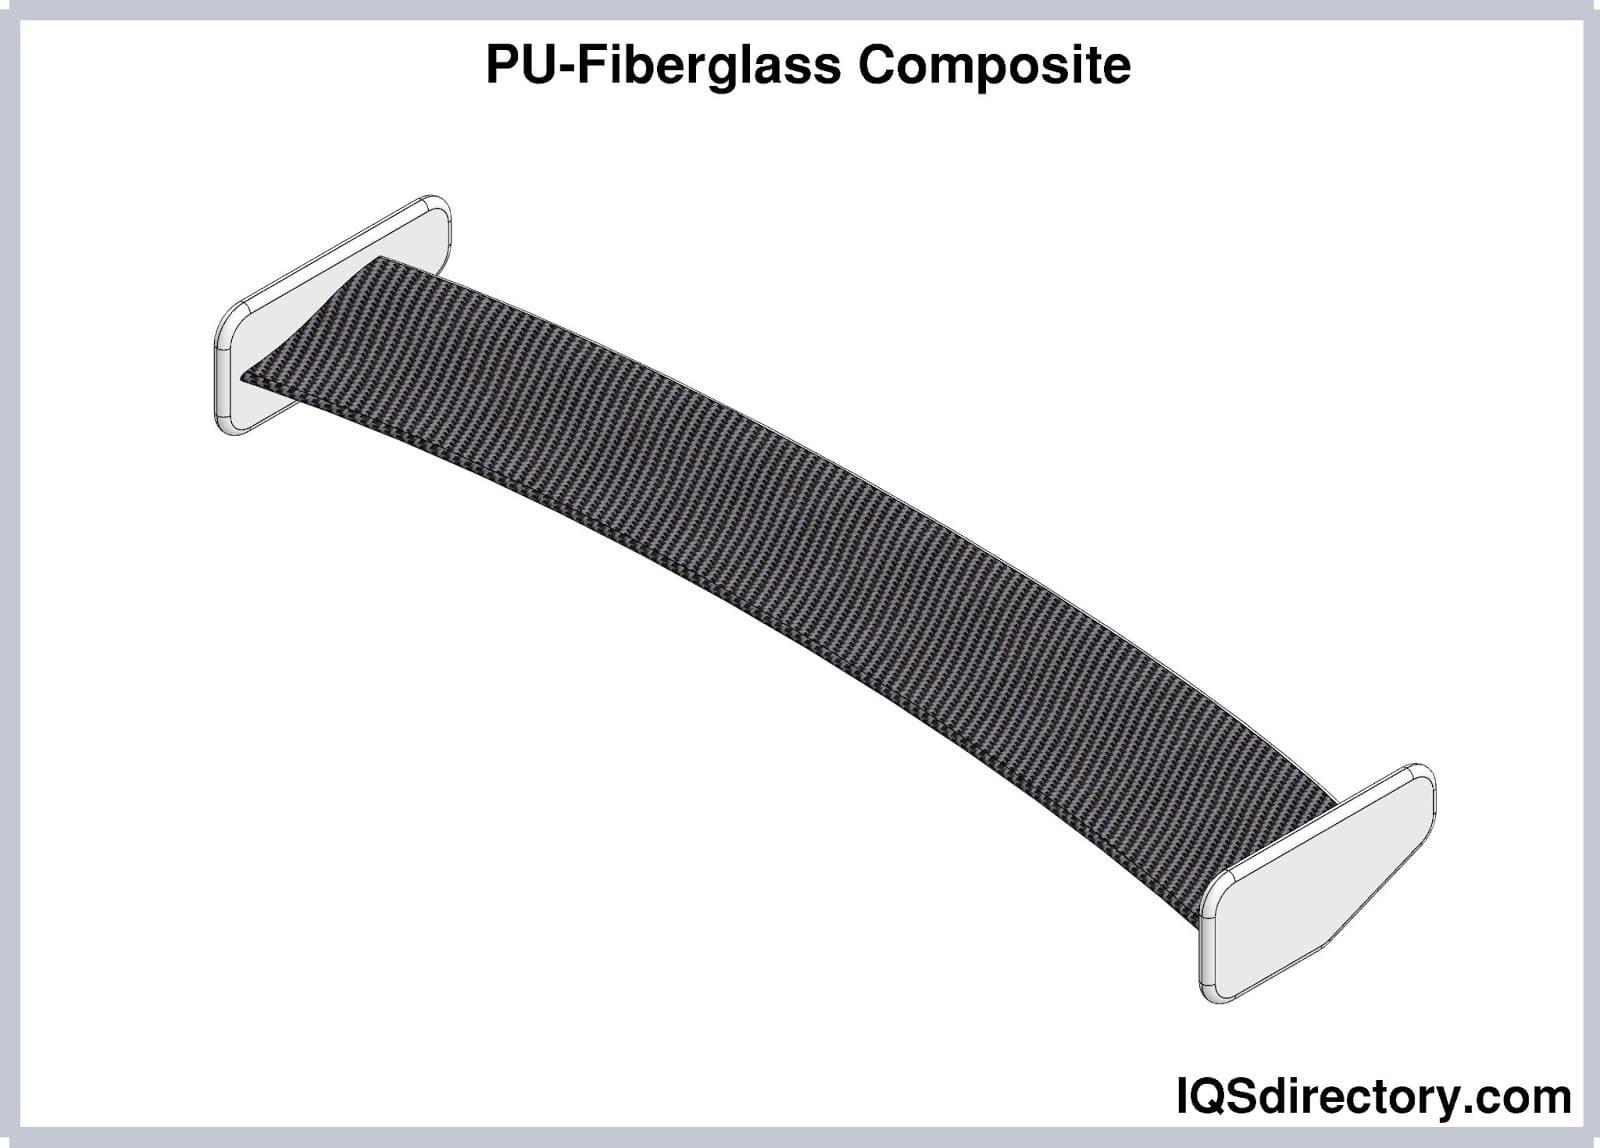 PU-Fiberglass Composite